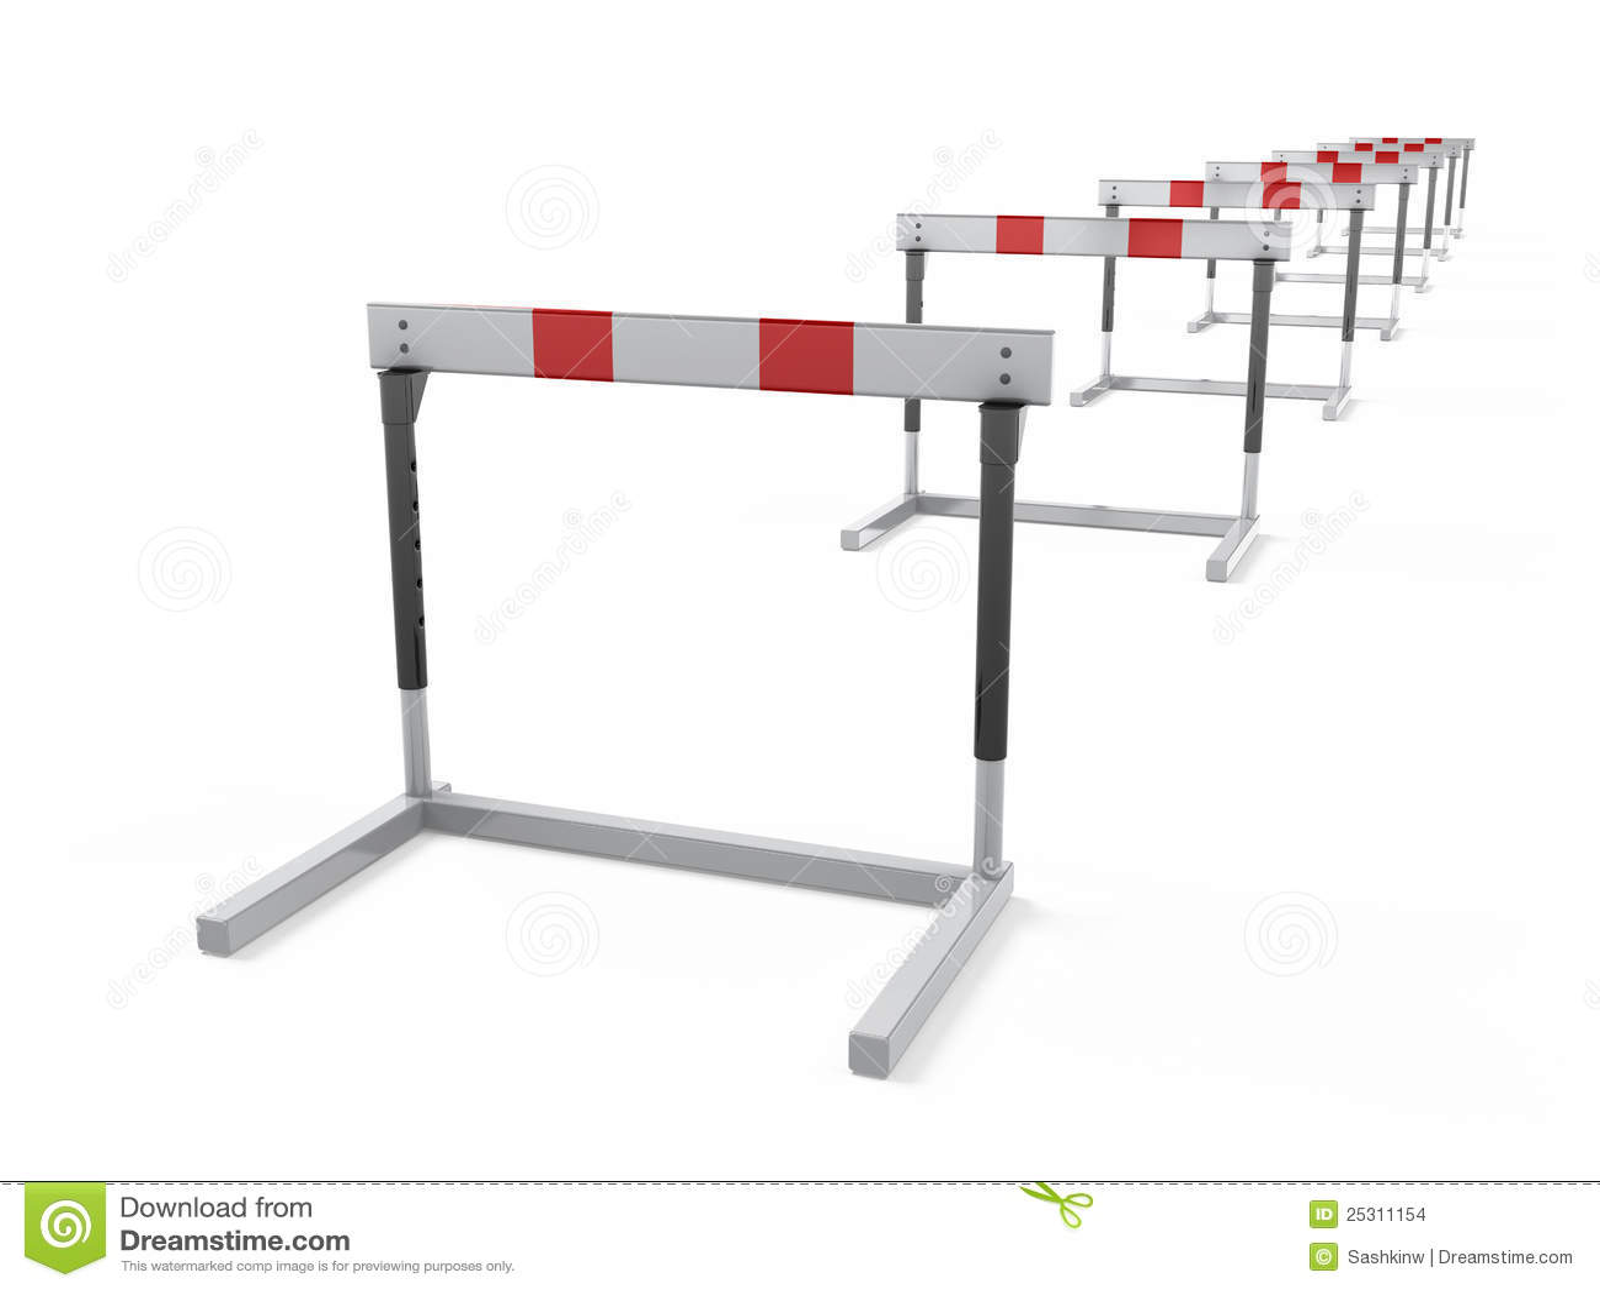 Hurdles Stock Images - Image: 25311154